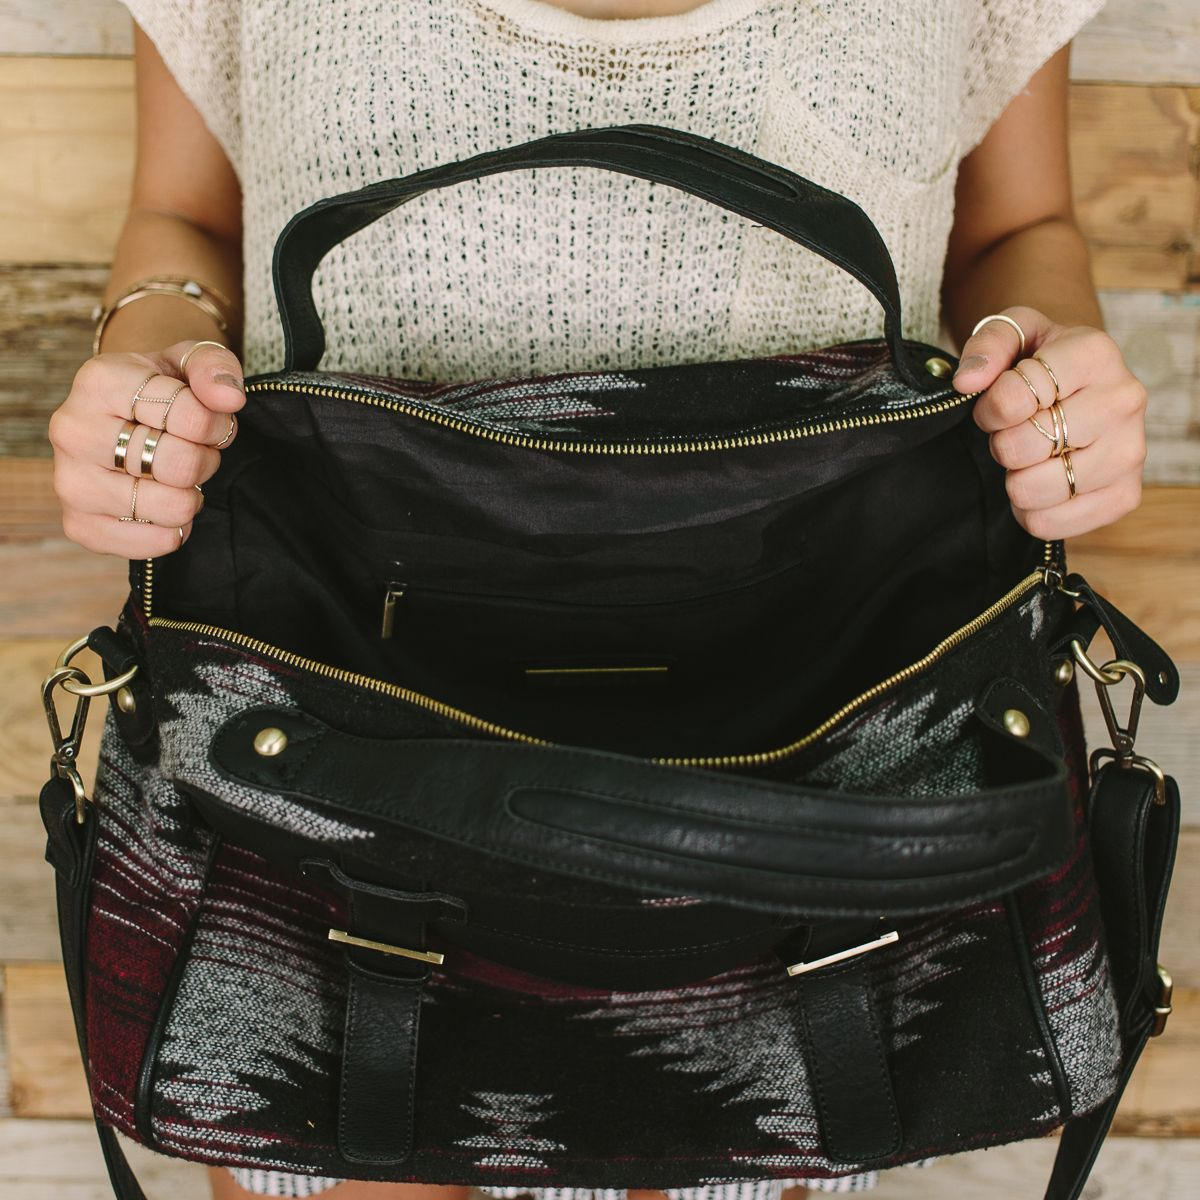 Cheyenne Wool Tote Bag, Nectar Clothing